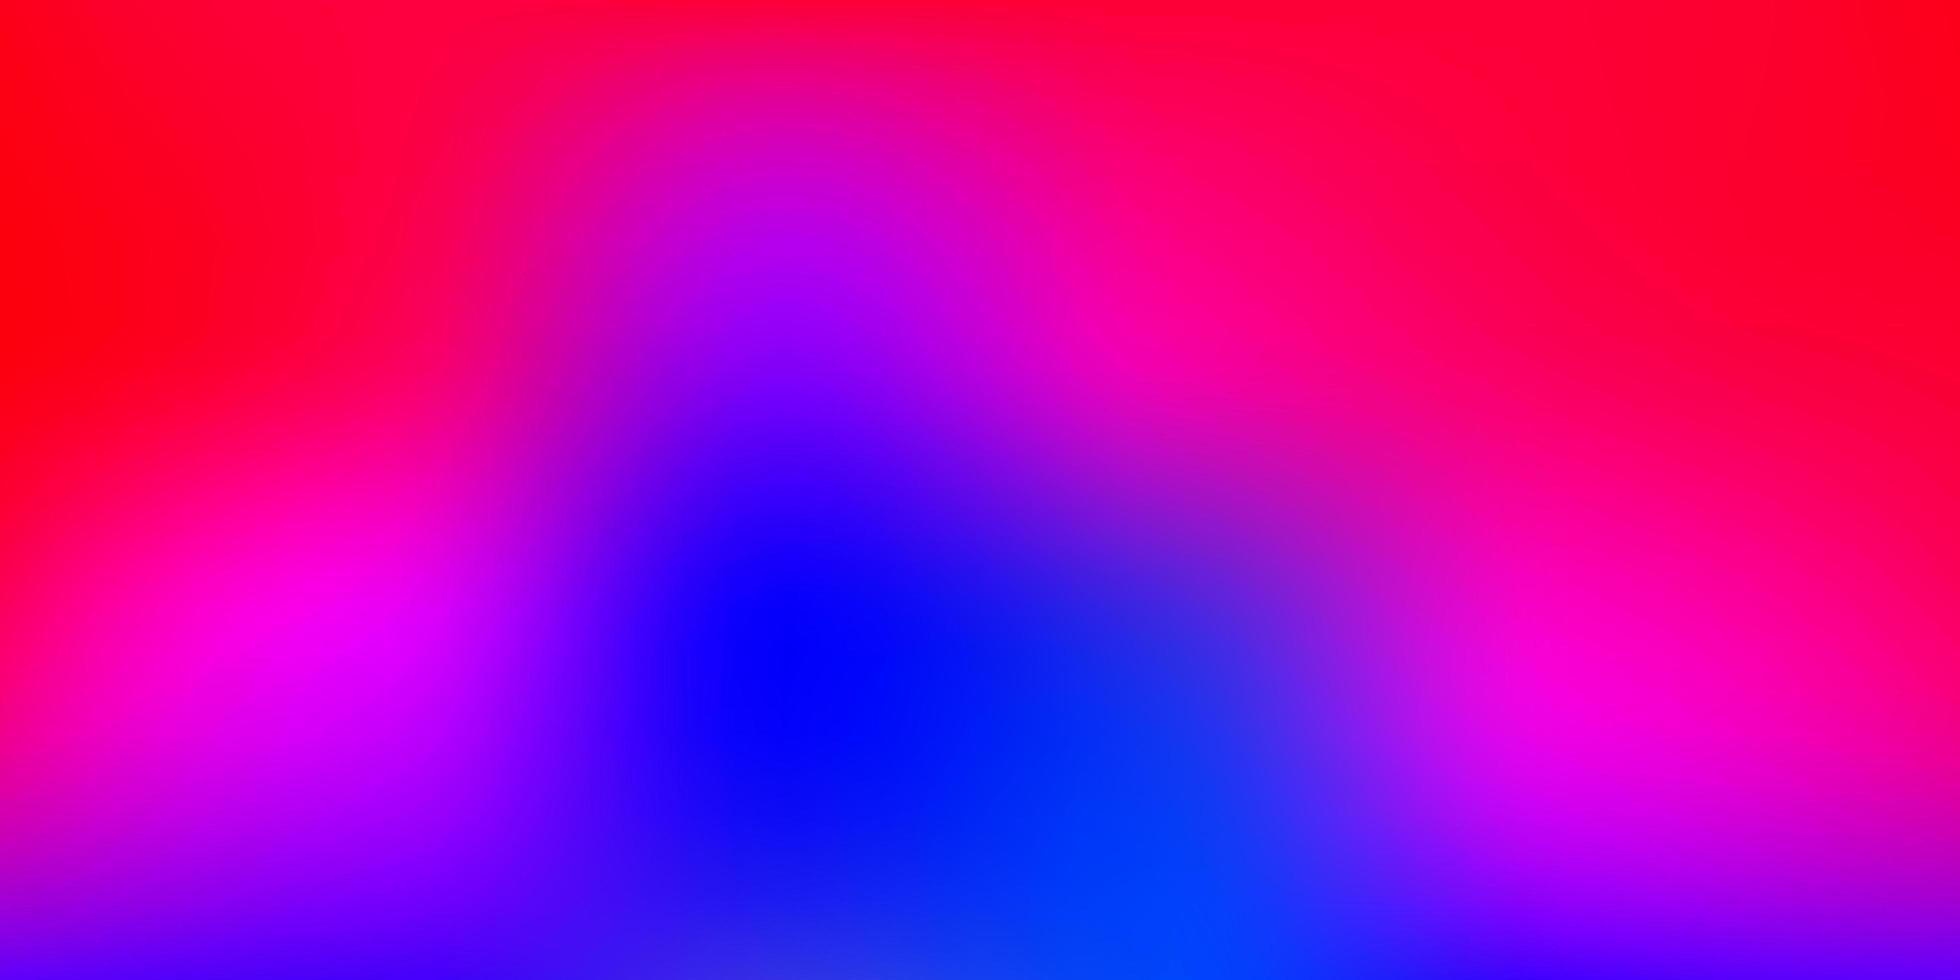 textura turva vector rosa escuro.